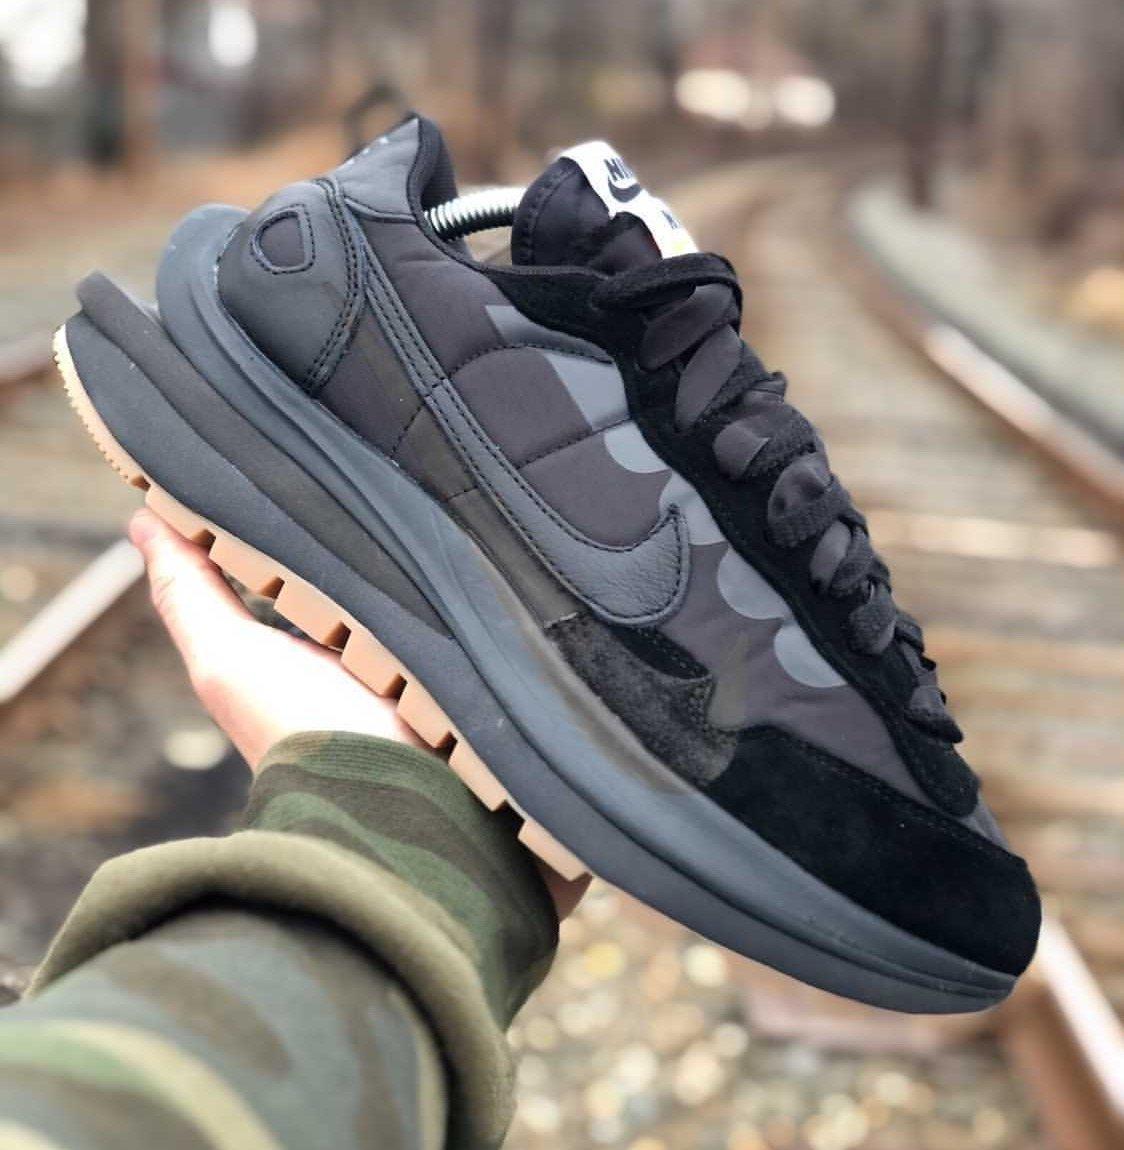 Sacai Nike VaporWaffle Off-Noir Black Gum Release Date Info